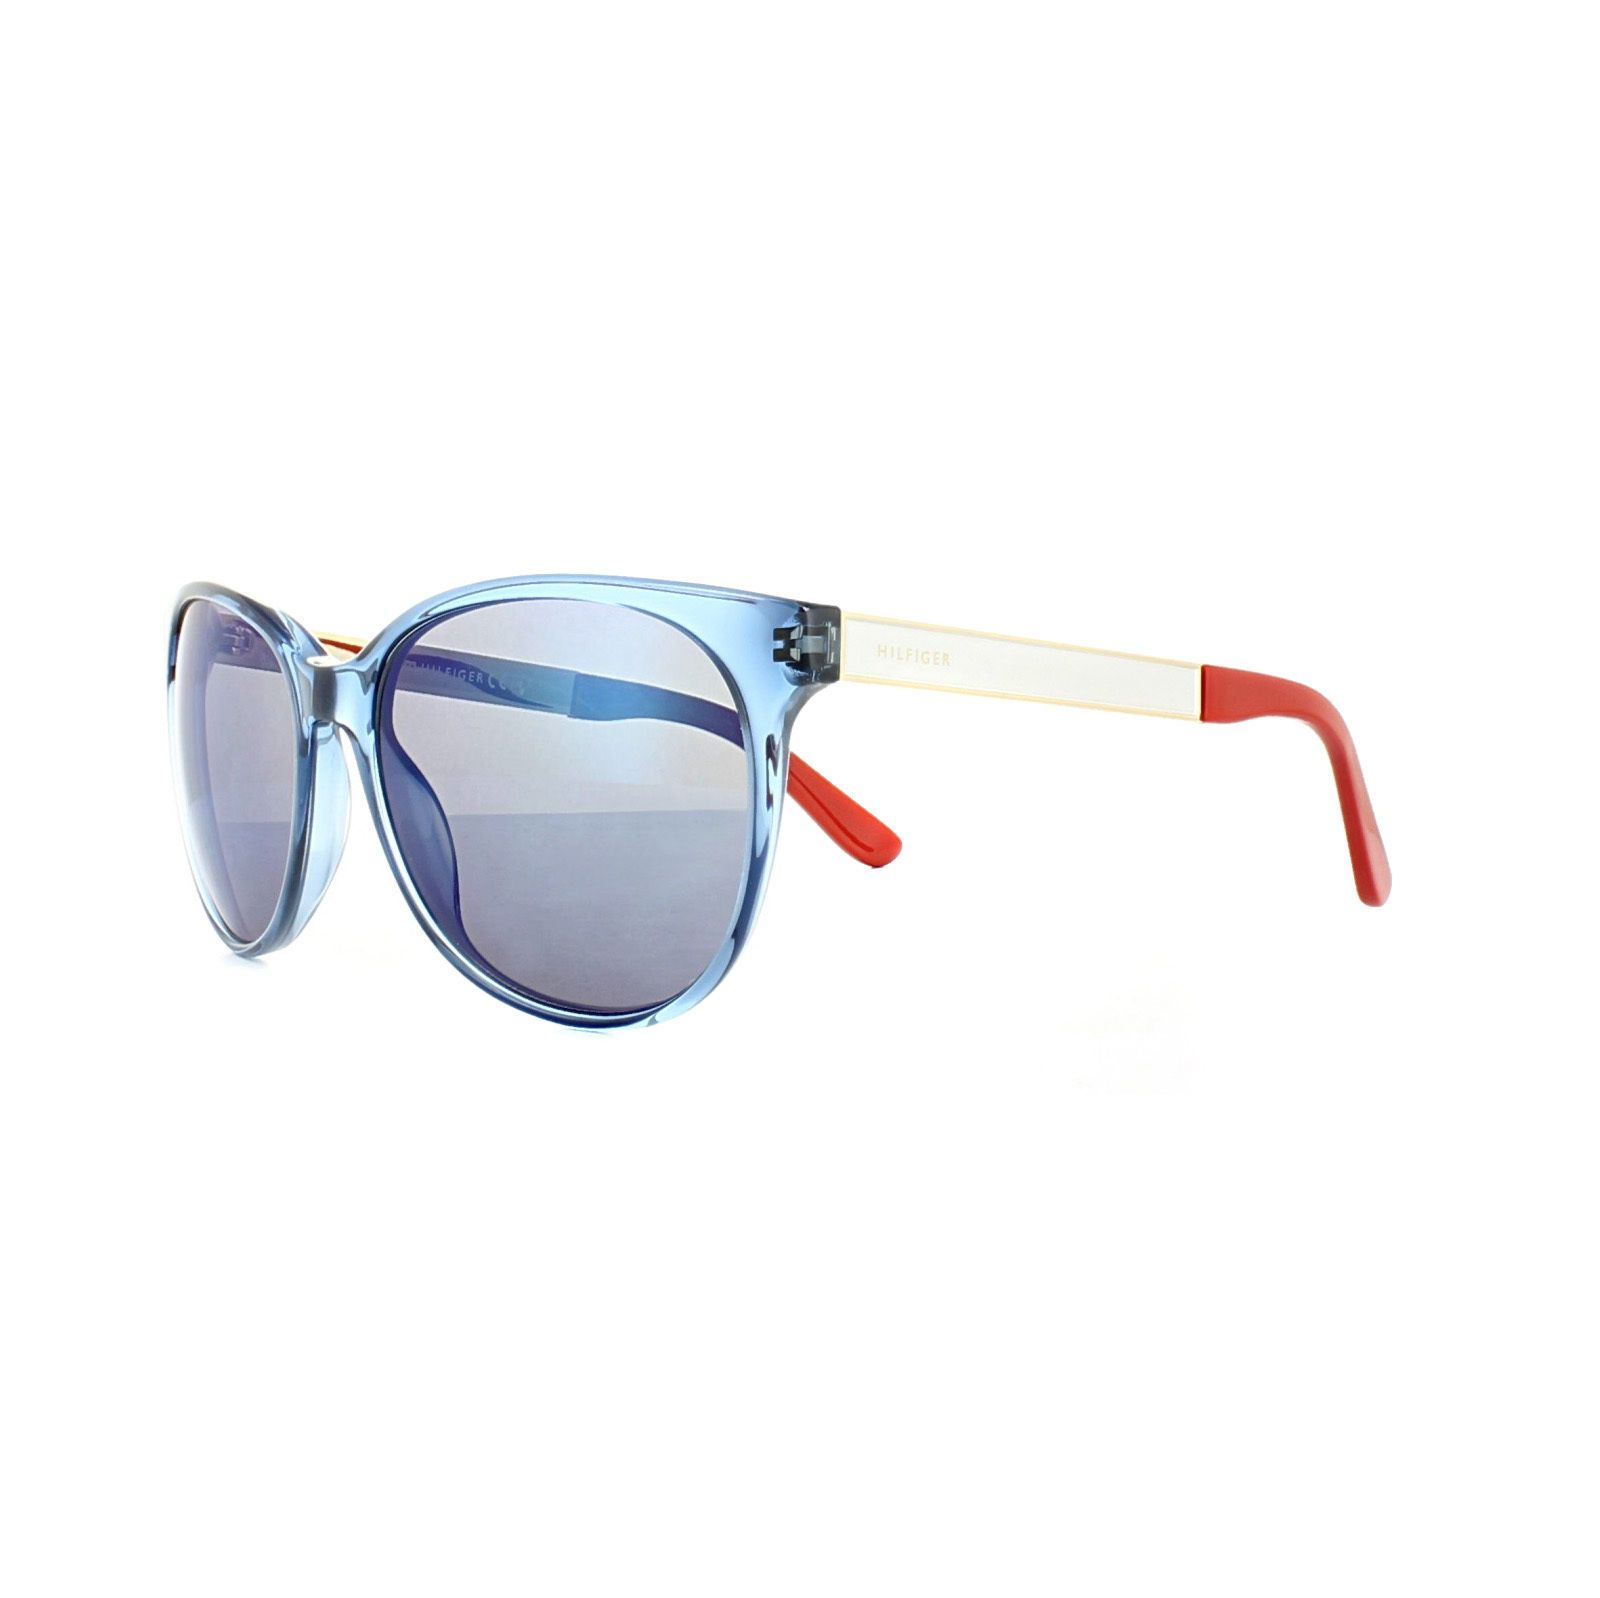 Tommy Hilfiger Sunglasses Th 1320 S 0h9 Xt Transparent Blue White Blue Mirror Blue Mirrors